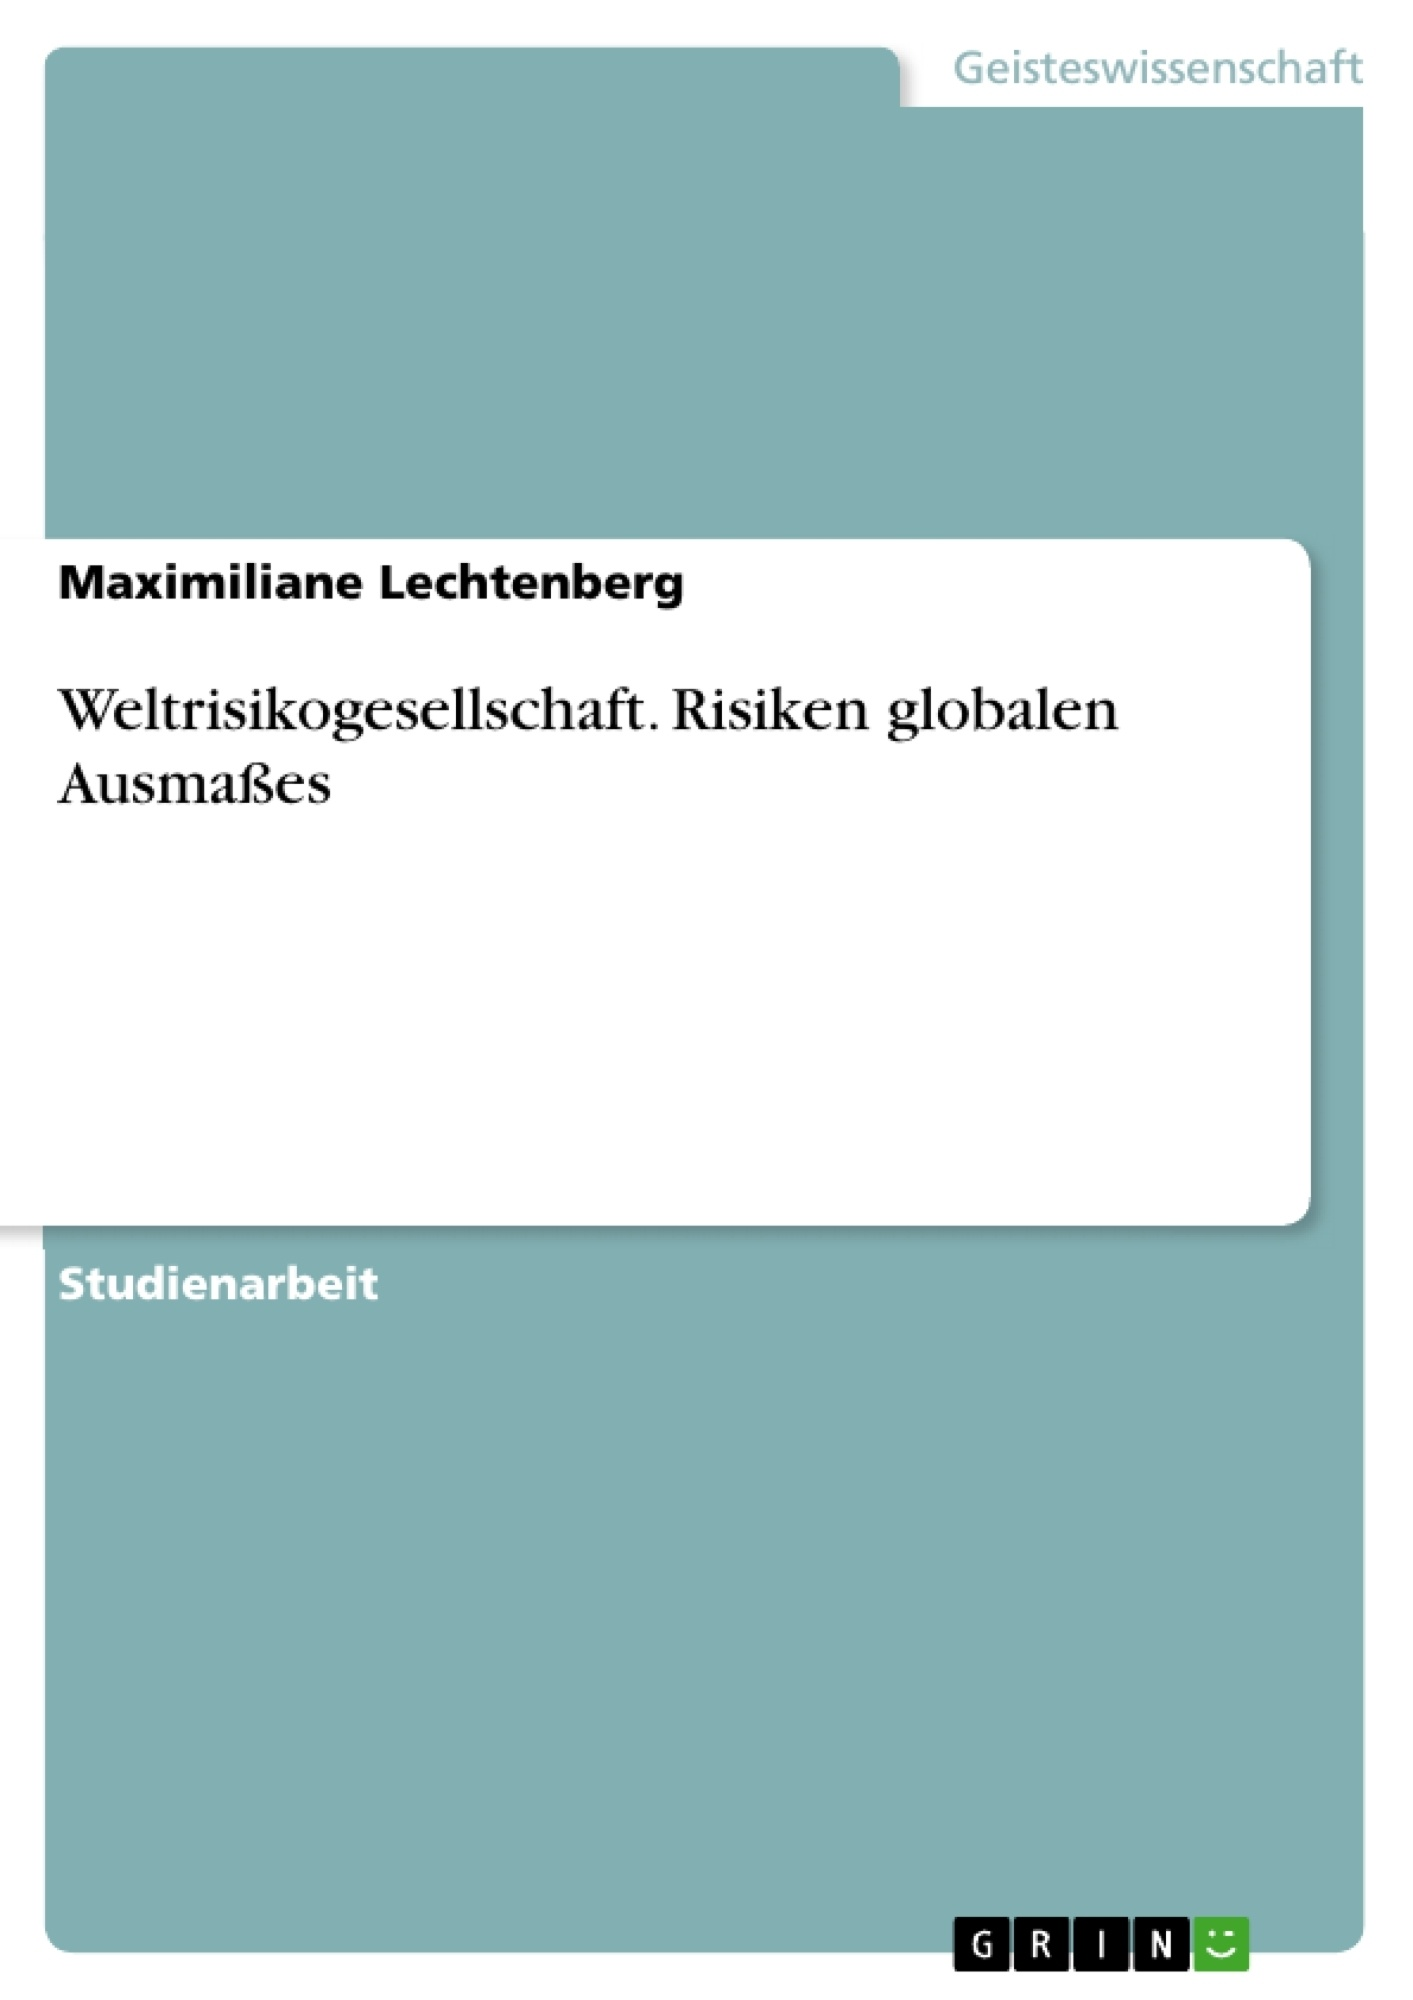 Titel: Weltrisikogesellschaft. Risiken globalen Ausmaßes